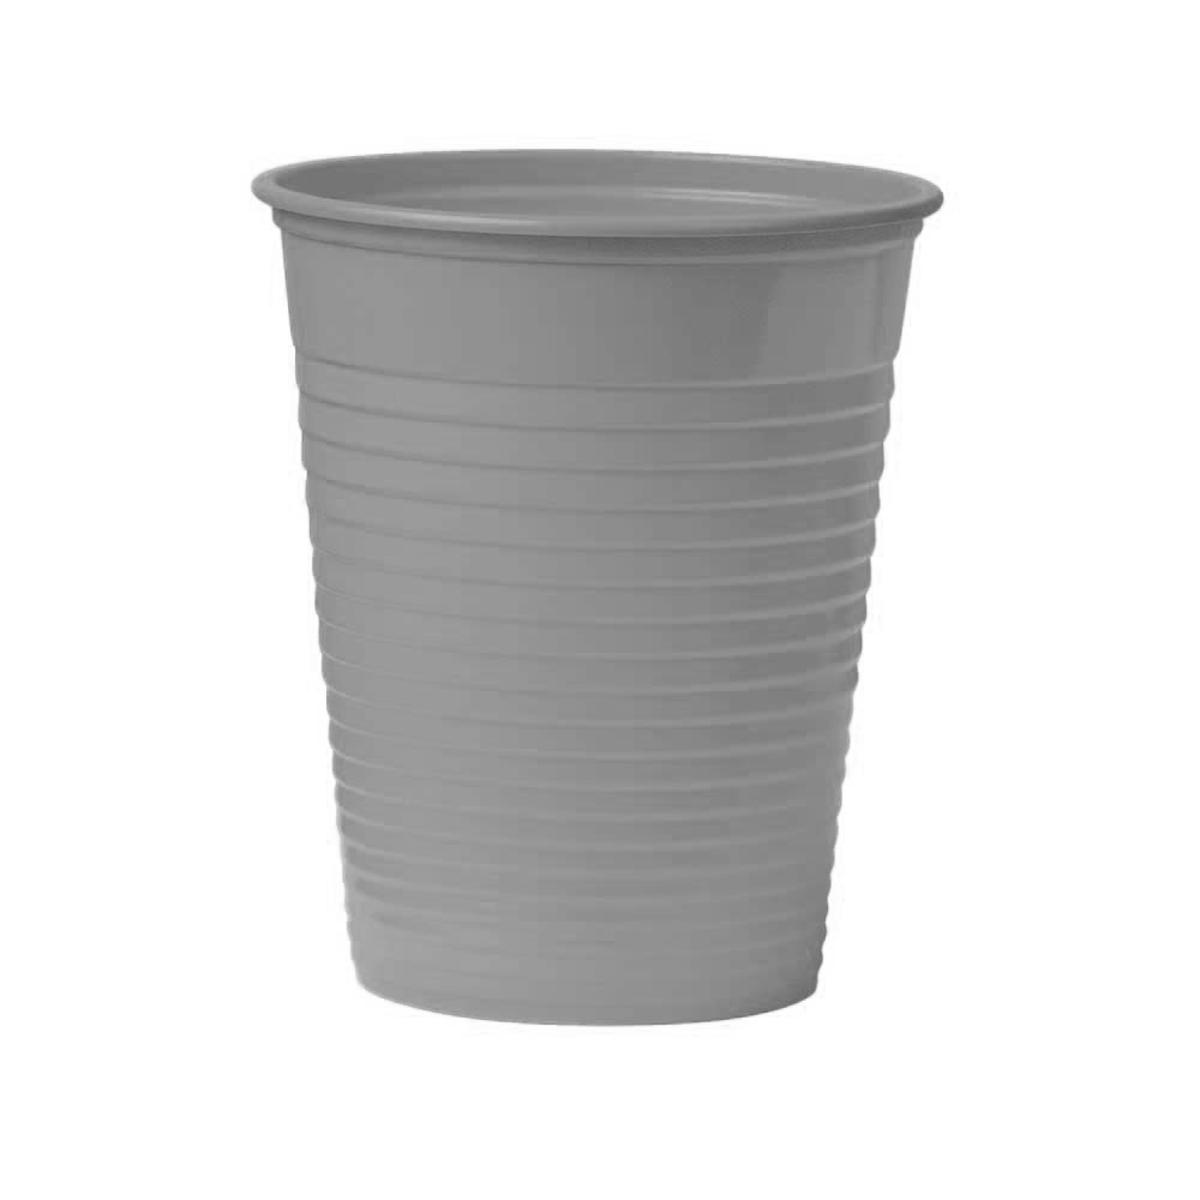 Mundspülbecher - Einwegbecher - Kaffee / Getränkebecher